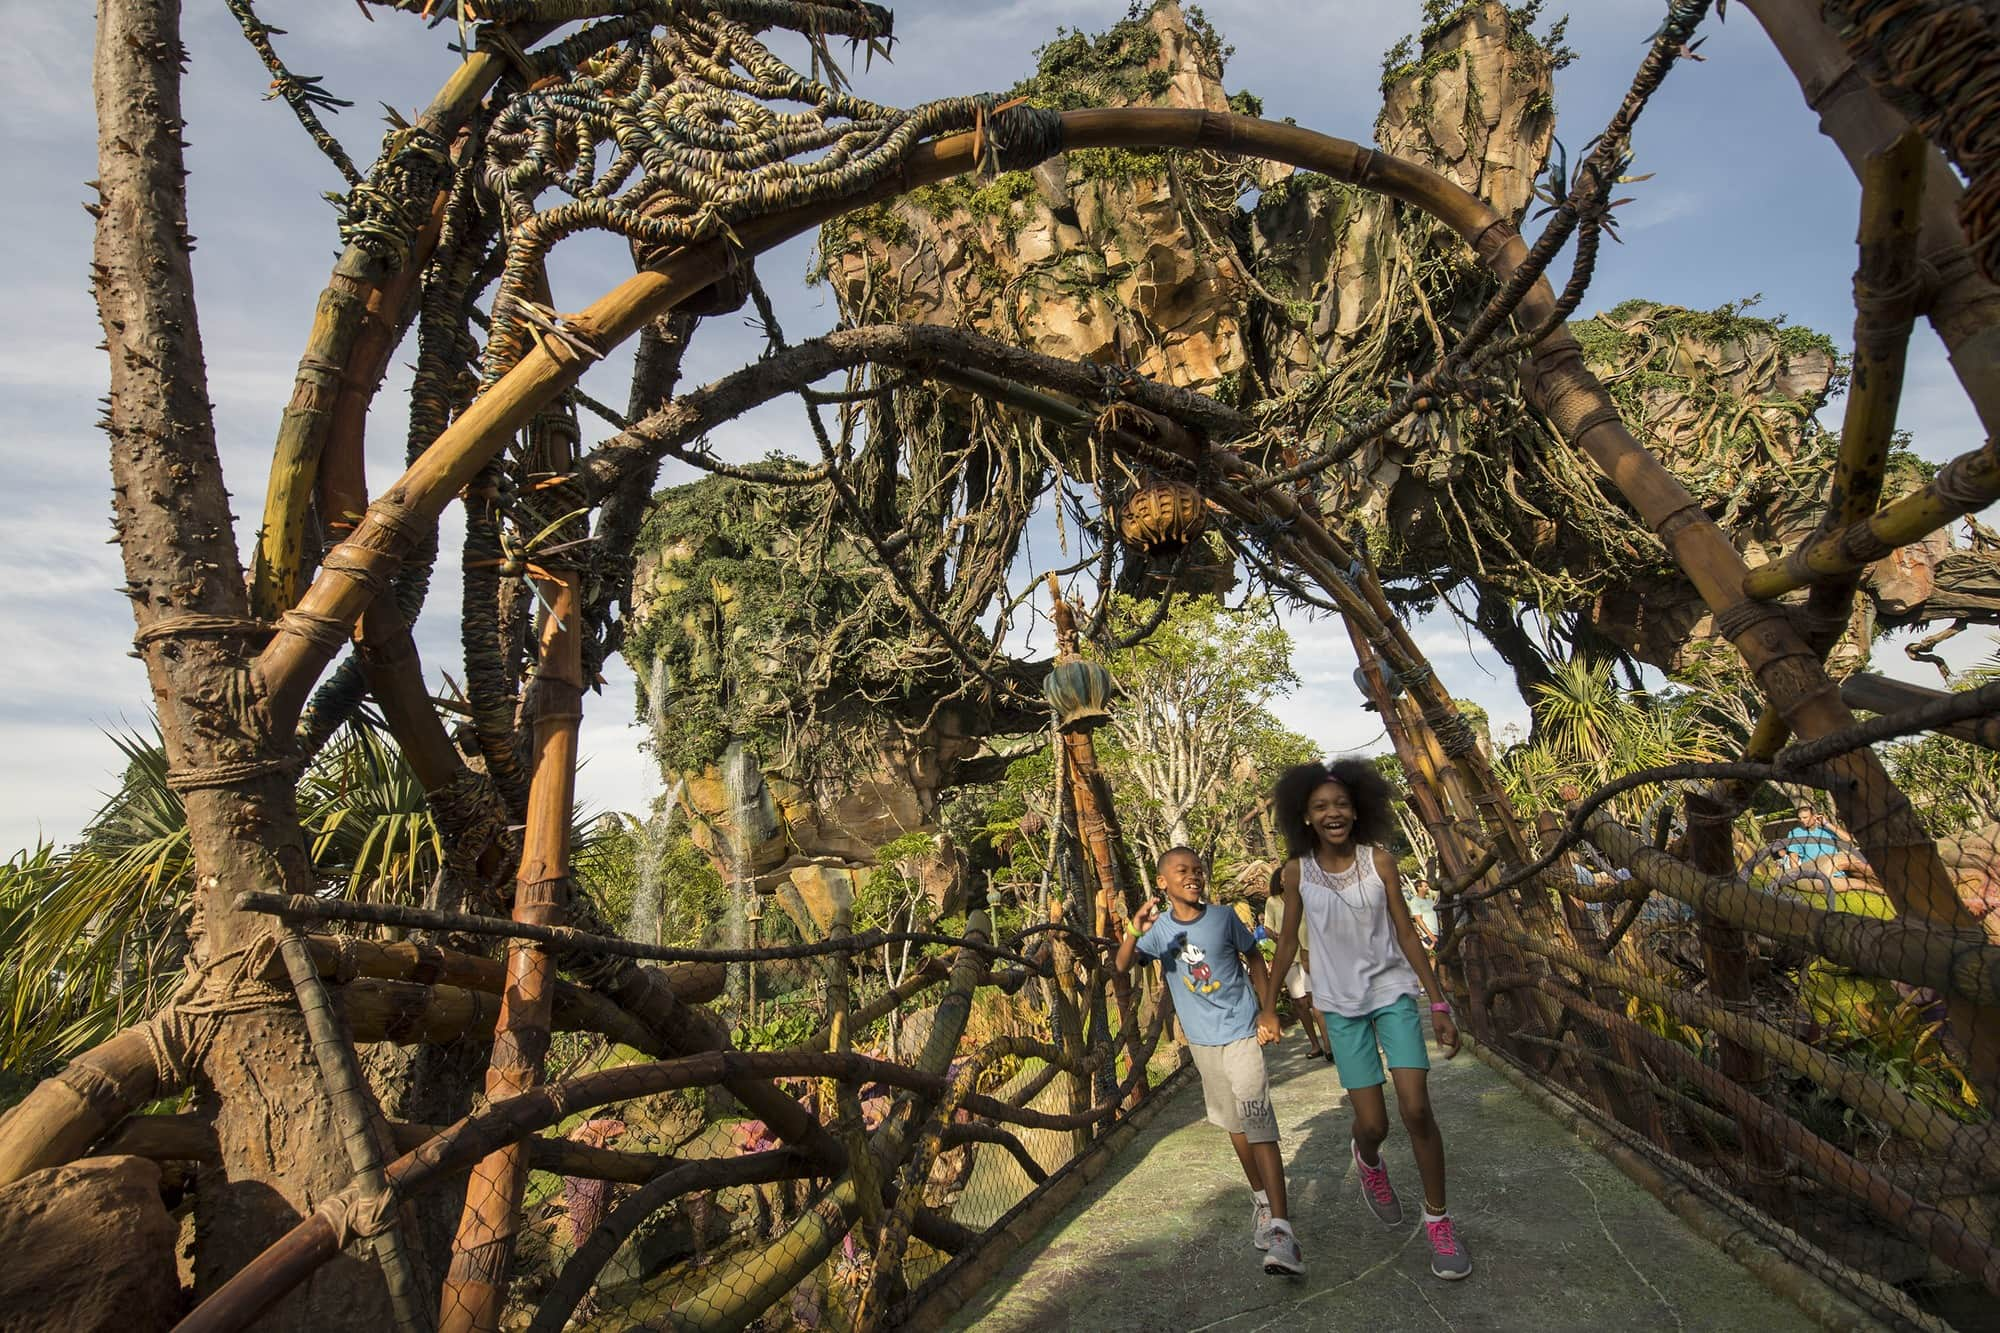 Teens exploring Pandora - The World of Avatar at Disney's Animal Kingdom ~ Disney World with Teens & Tweens